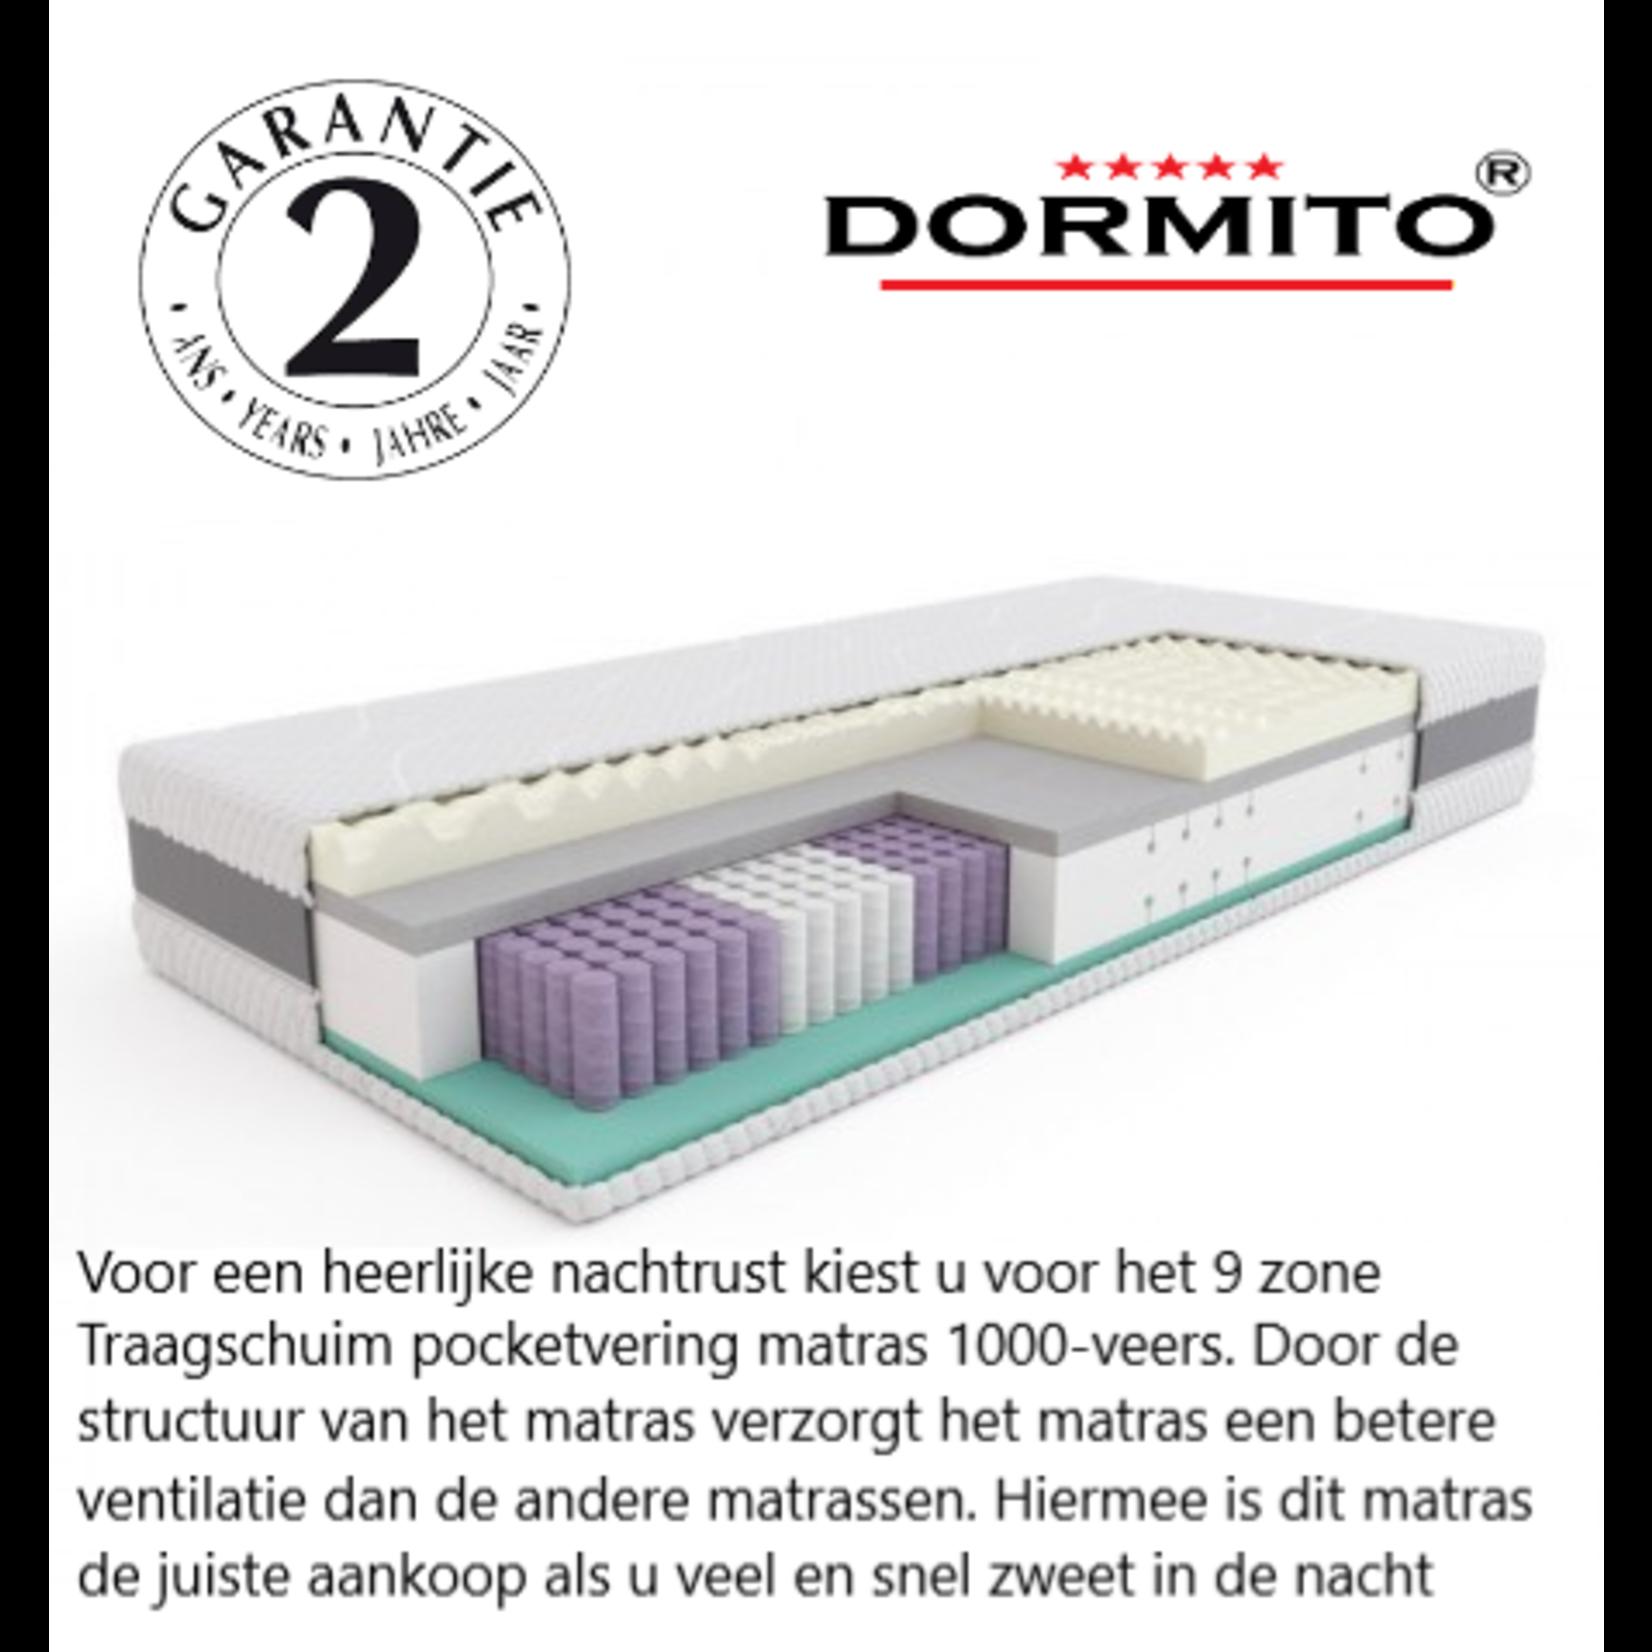 Dormito 9-zone Pocketvering TRAAGSCHUIM 20 cm dik